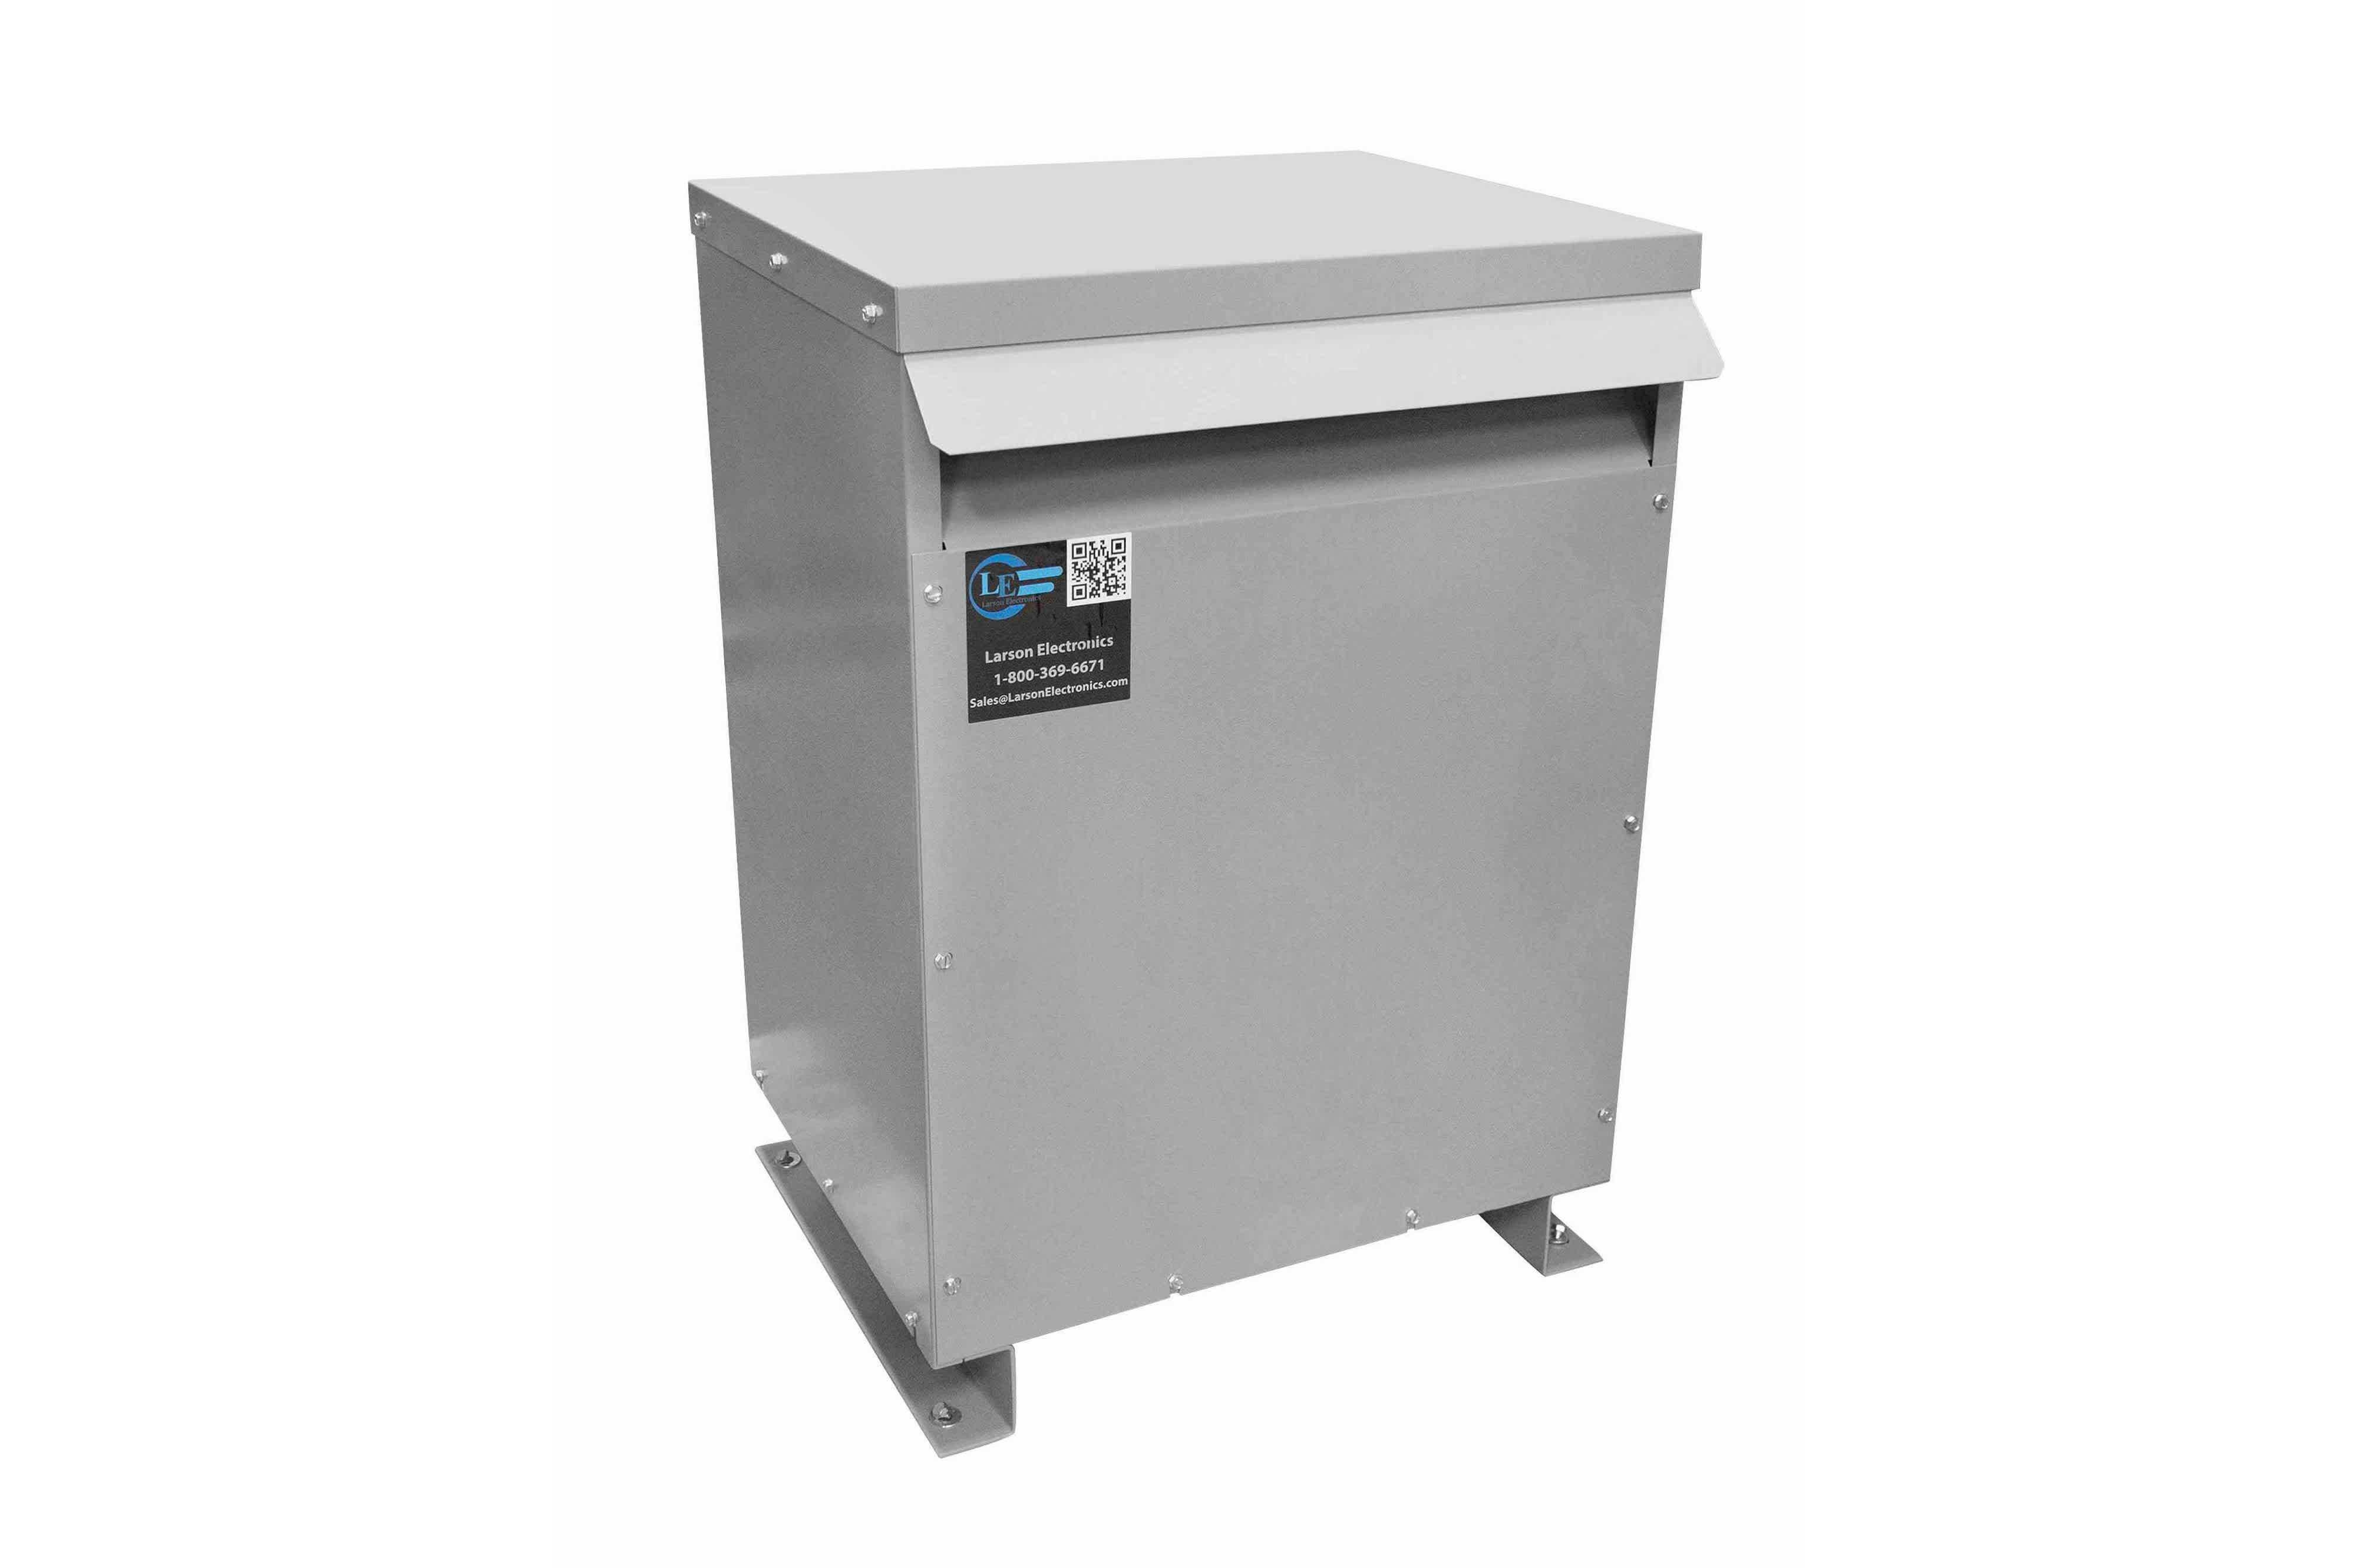 22.5 kVA 3PH Isolation Transformer, 240V Wye Primary, 208Y/120 Wye-N Secondary, N3R, Ventilated, 60 Hz